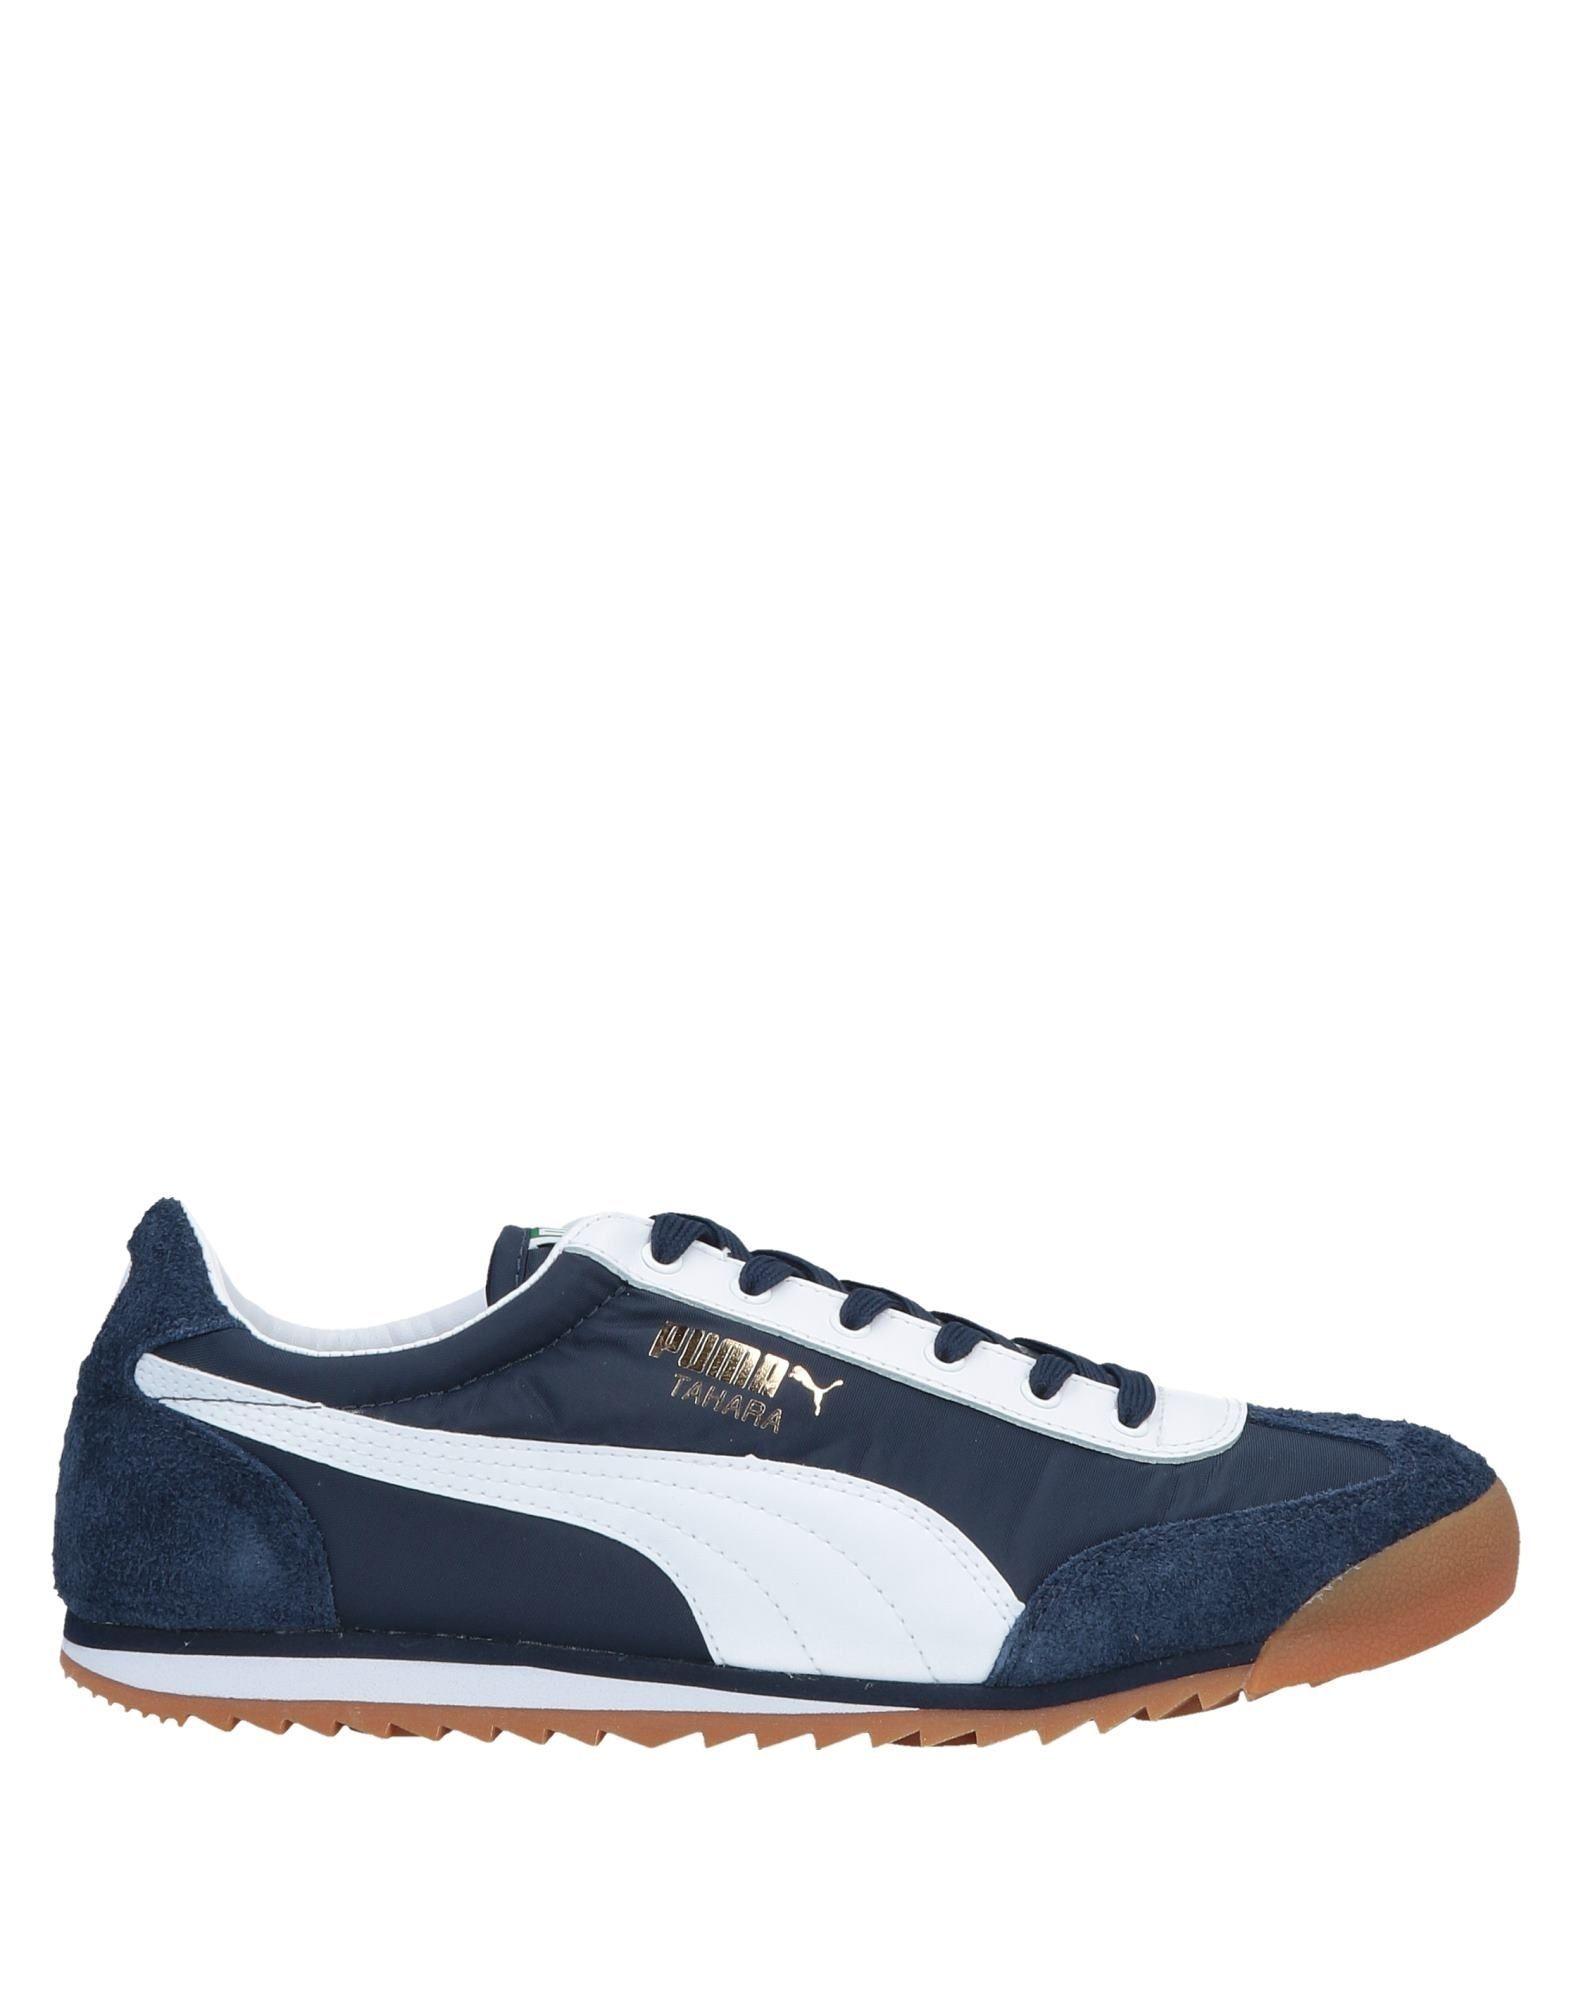 Puma Sneakers In Dark Blue | ModeSens